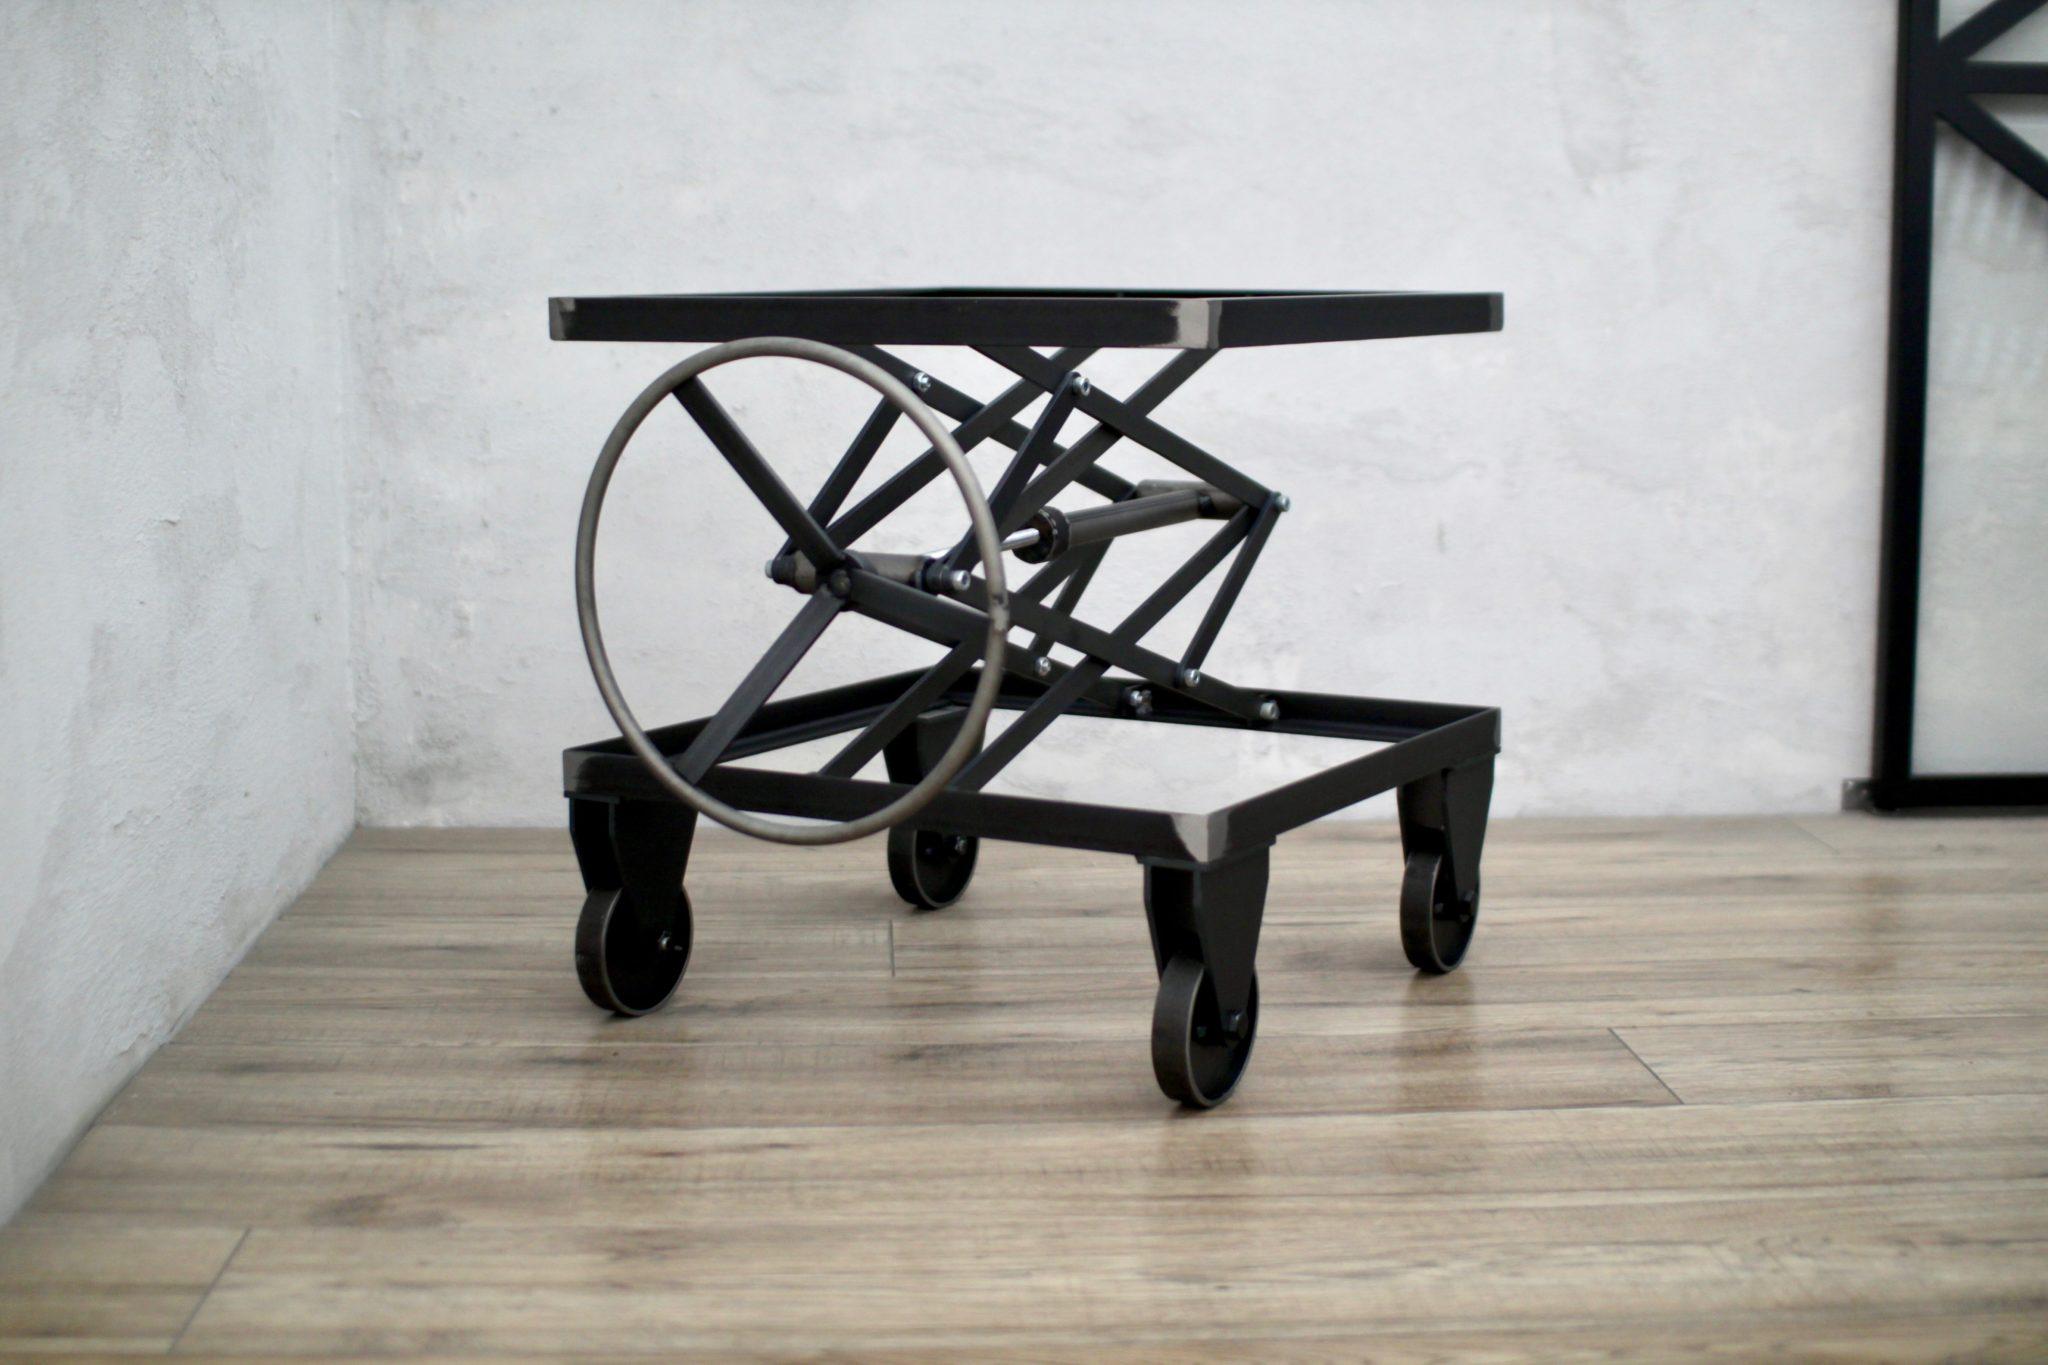 stolik Icon Winch, stolik industrialny, stolik kawowy, stolik podnośnik, podnośnik nożycowy stolik, stolik loft, stolik nowoczesny, stolik metalowy